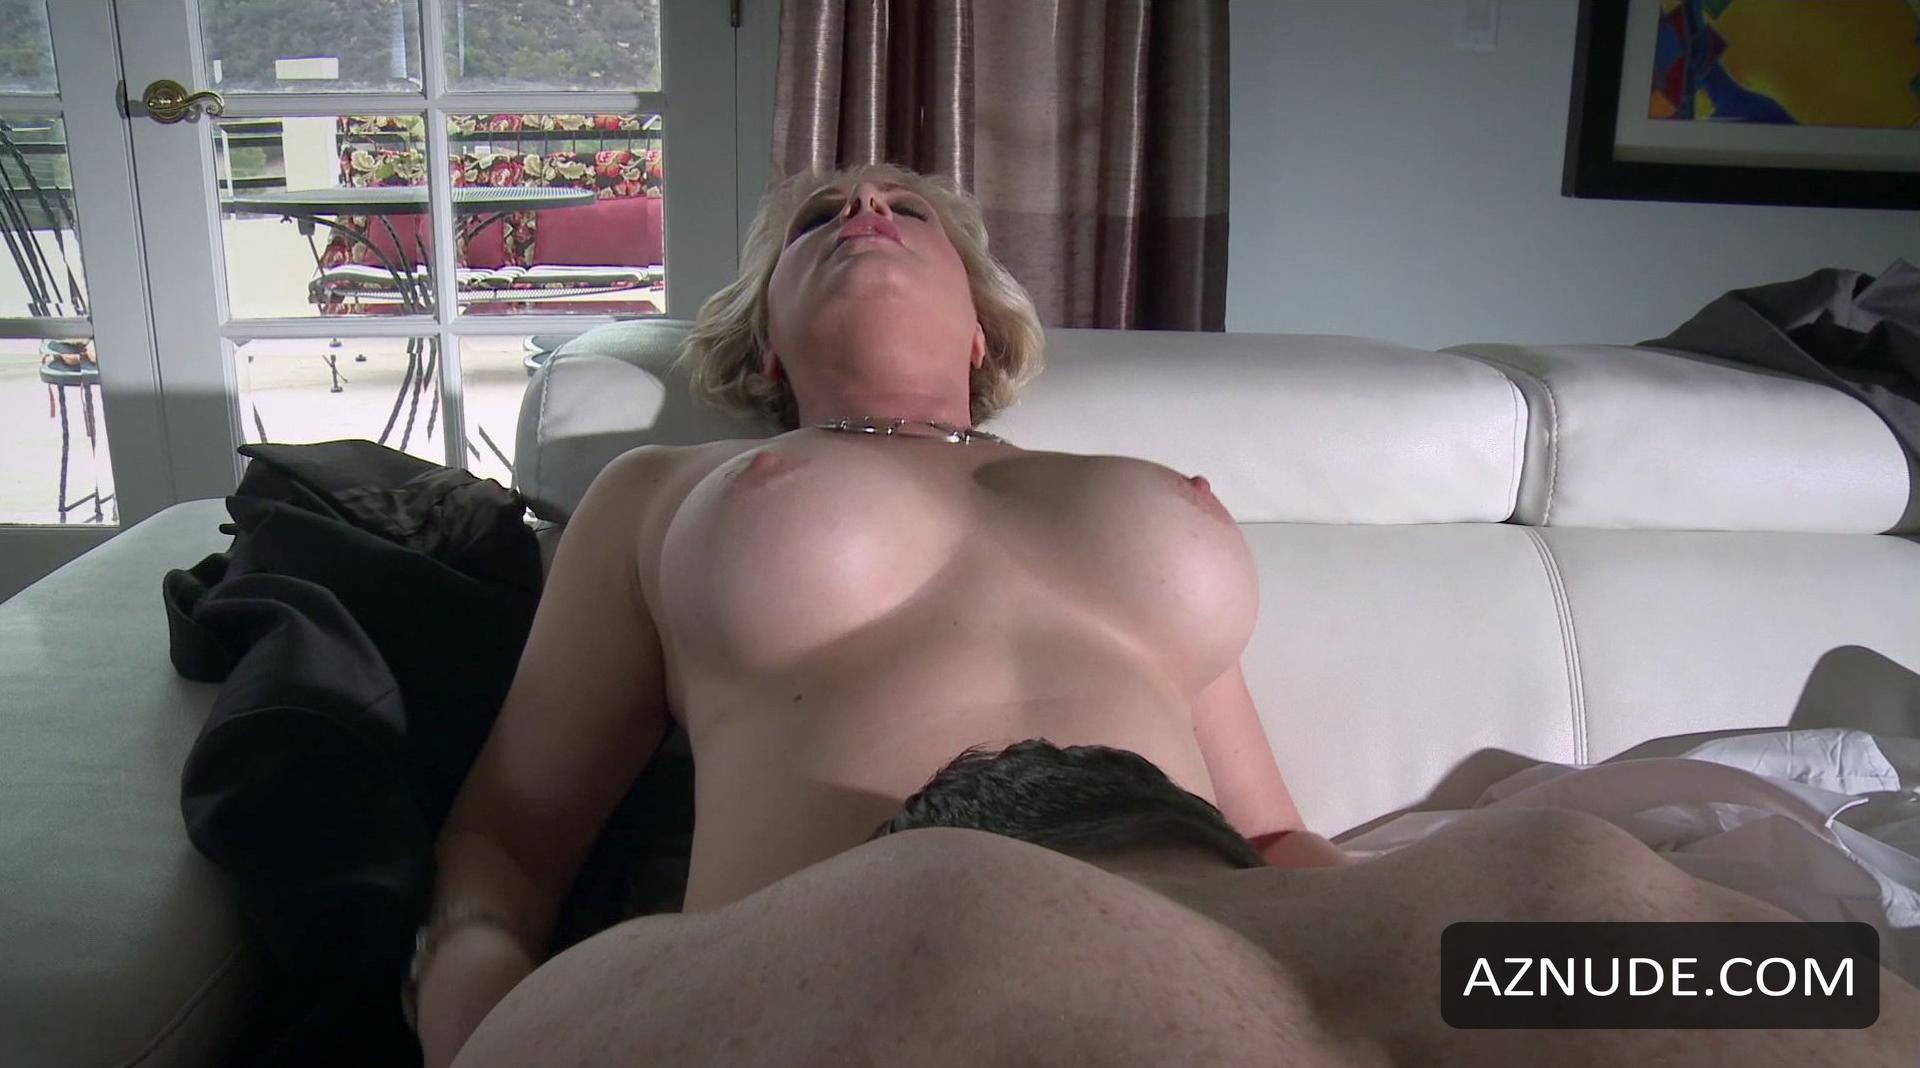 Nude asian porn pics-9319